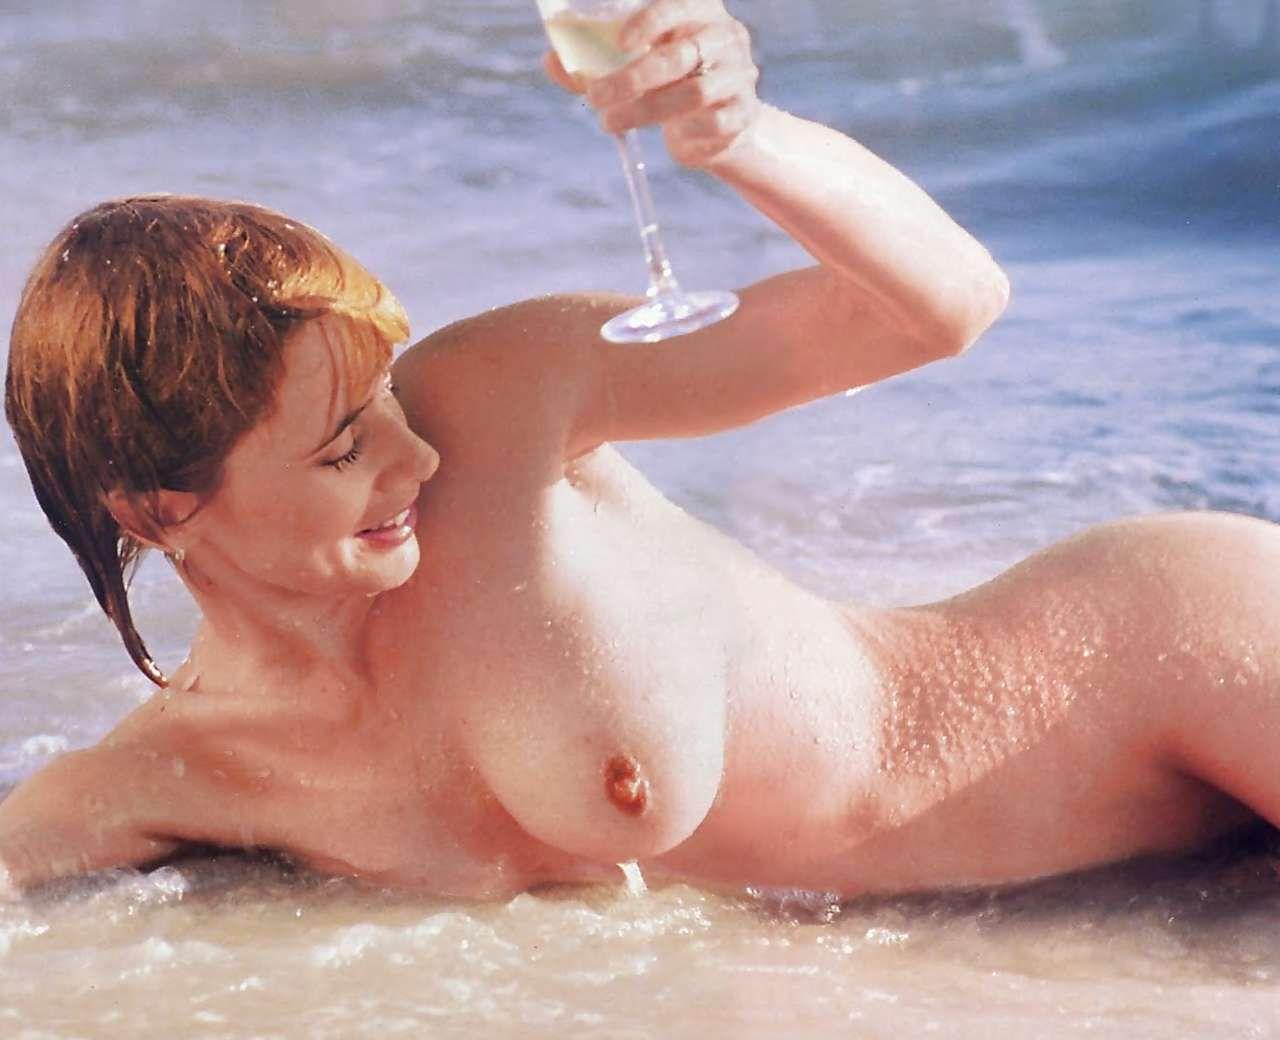 rossana arquette nude pics